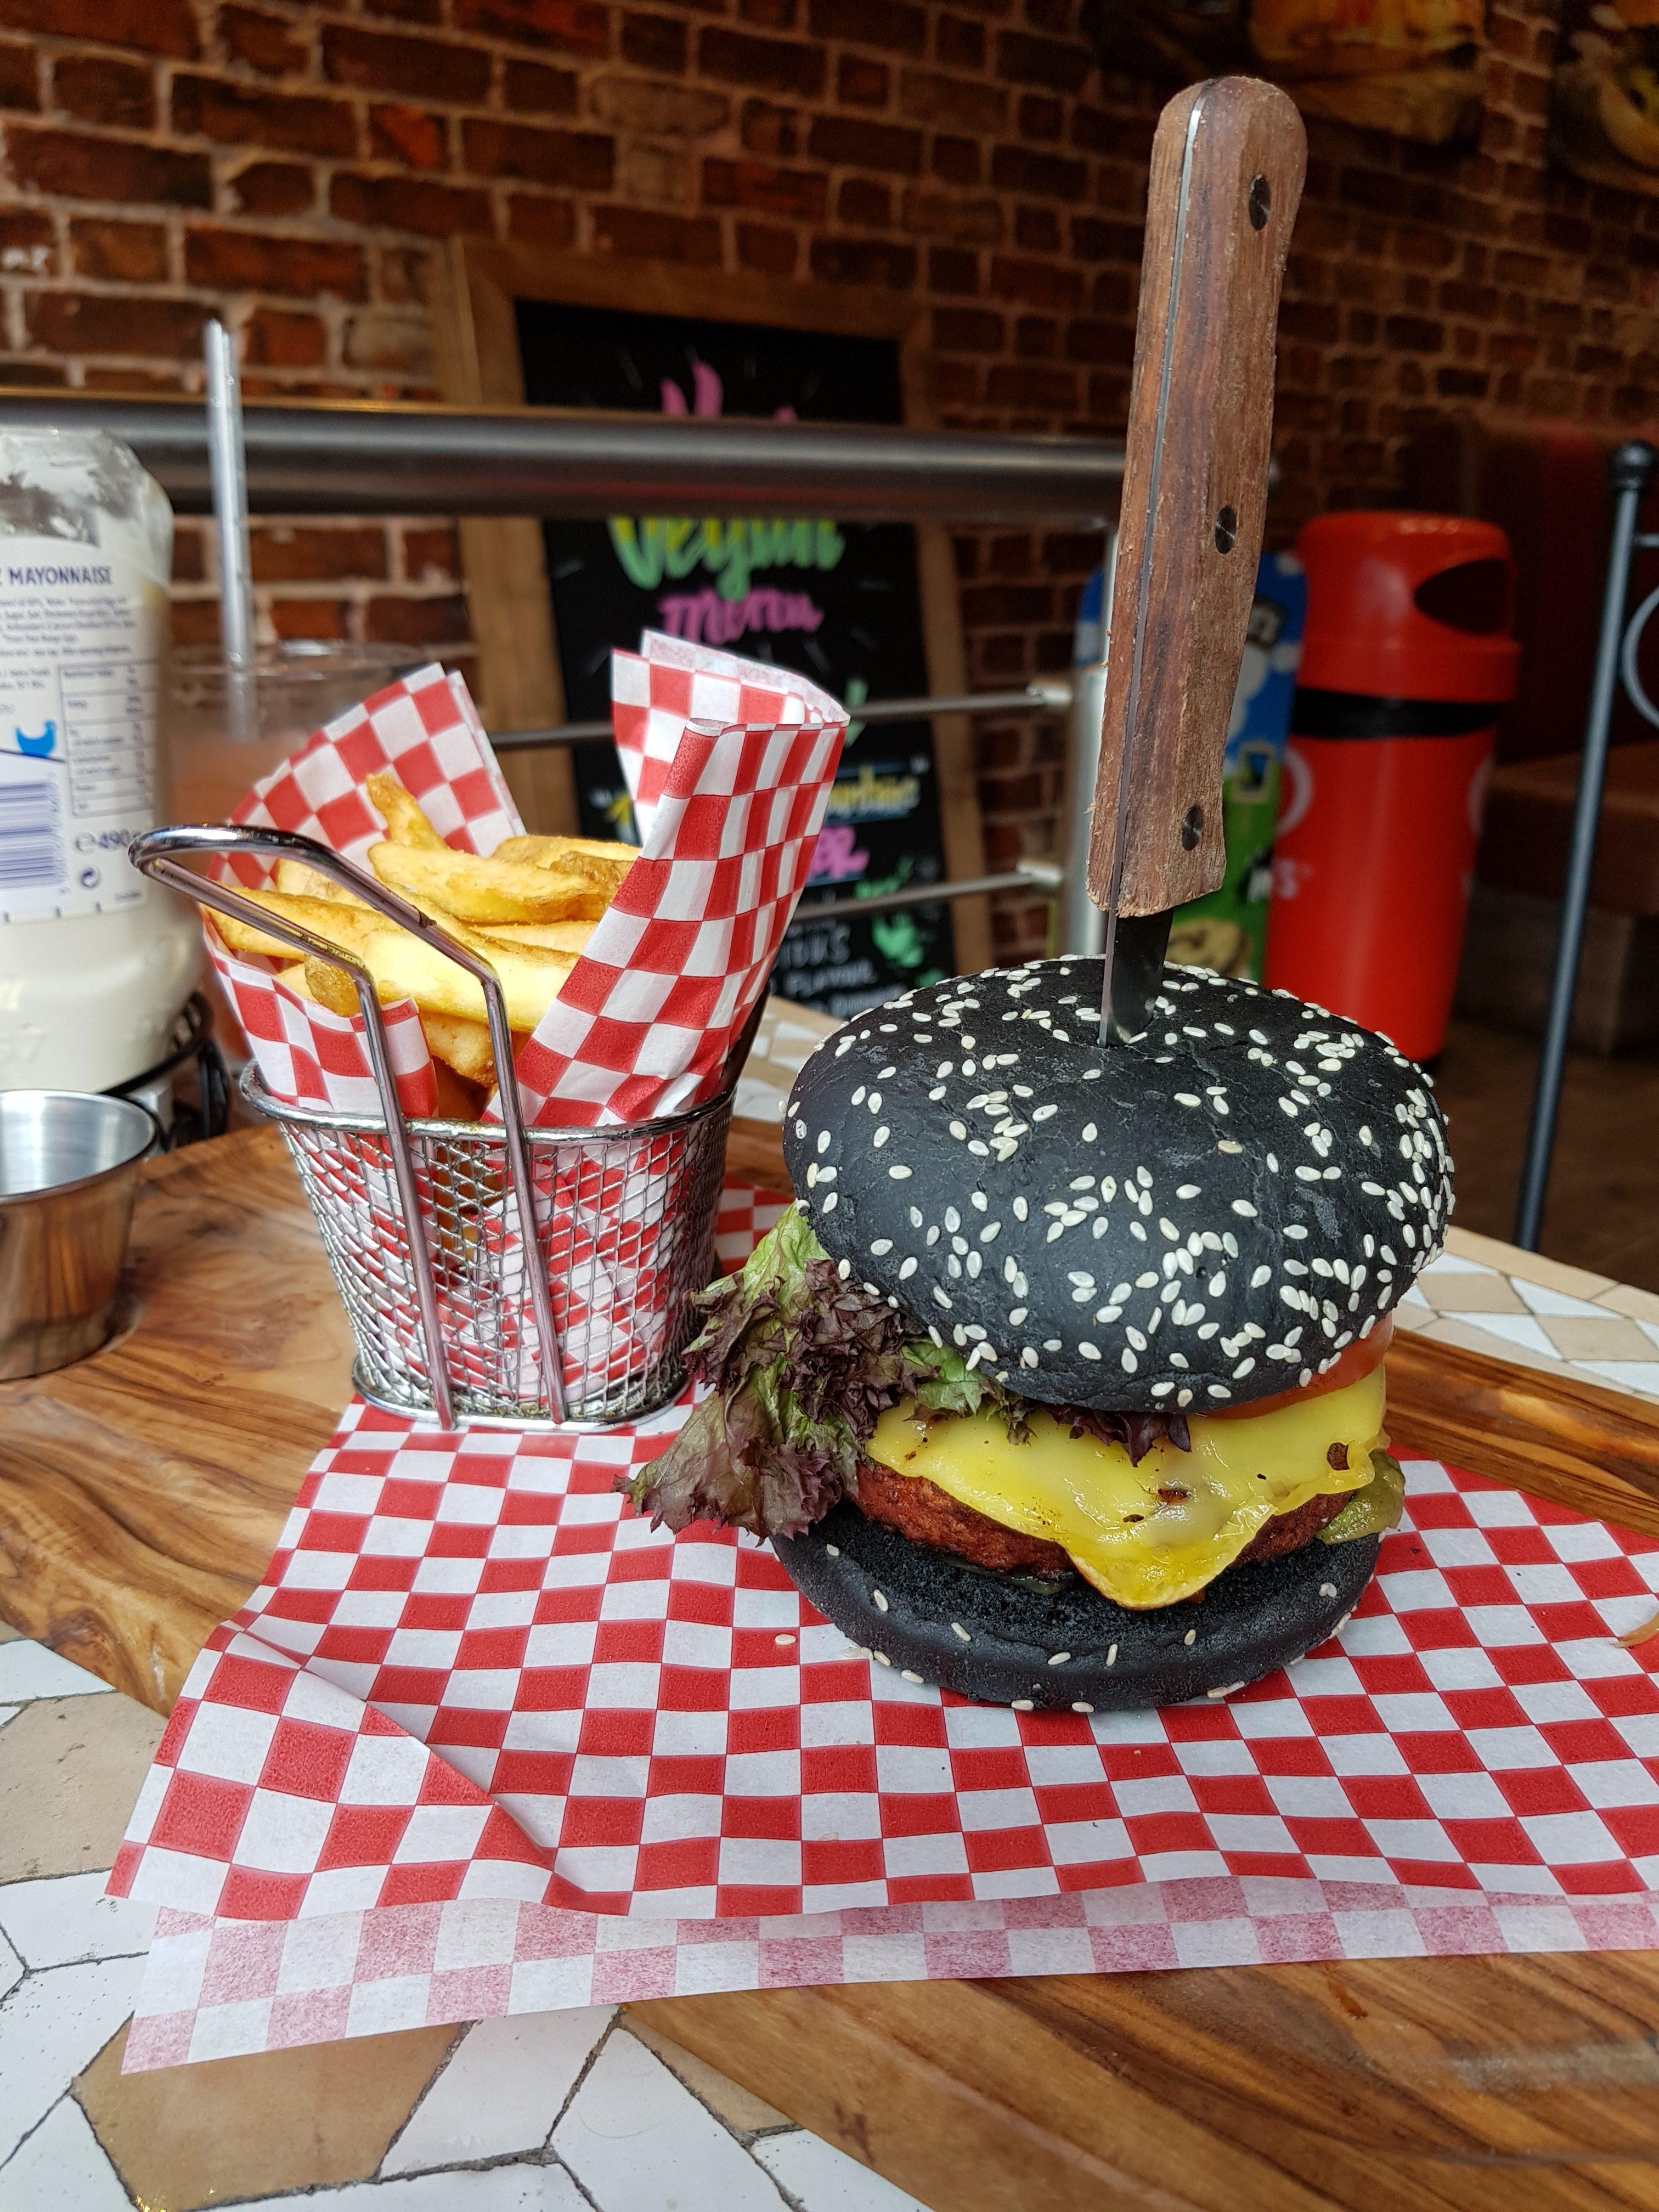 Joe & Co Burgers in Fulham, SW London. the Vegan Moving Mountains burger